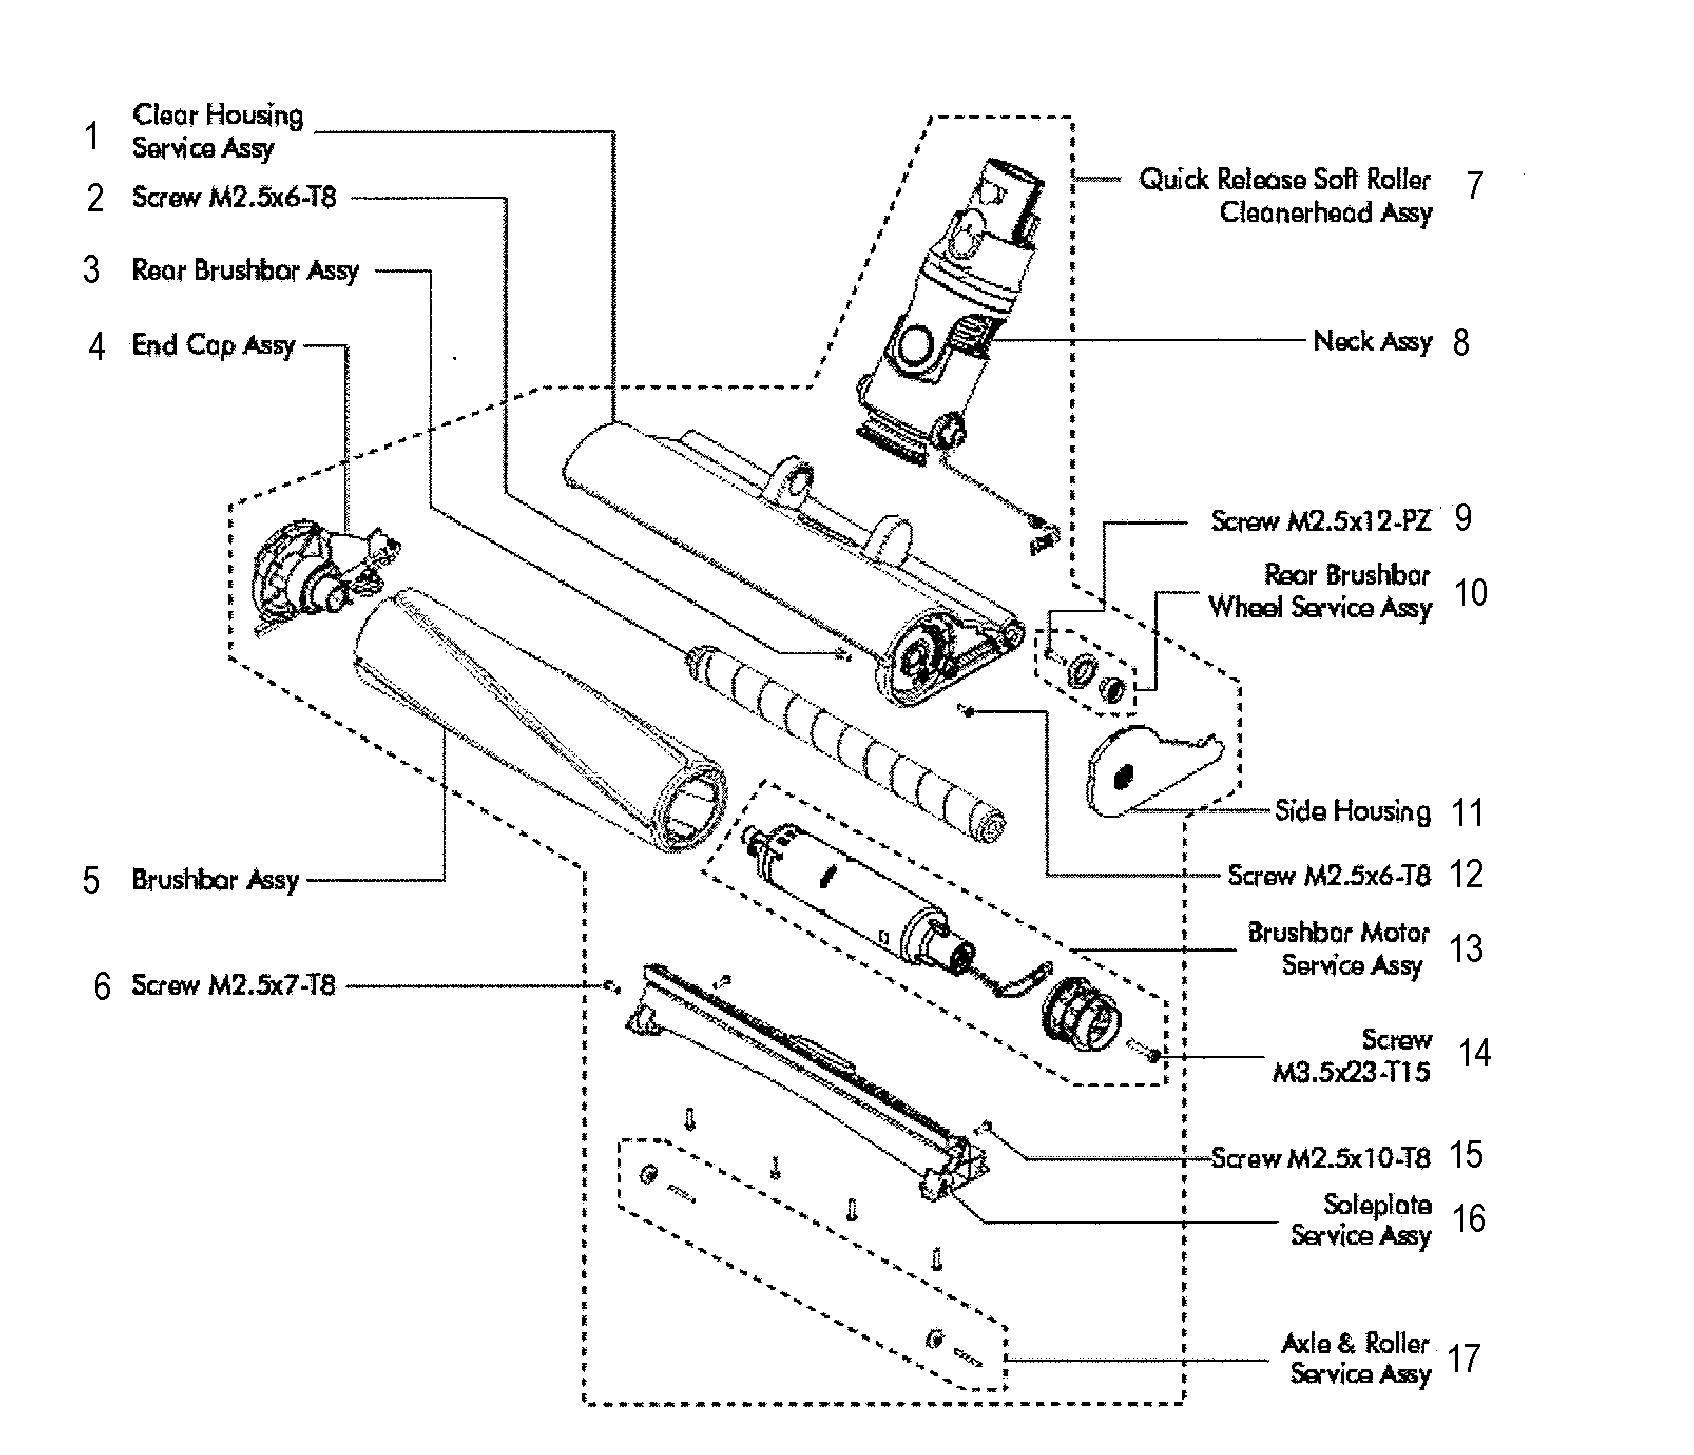 Dyson model V8-SV10 vacuum, hand-held genuine parts